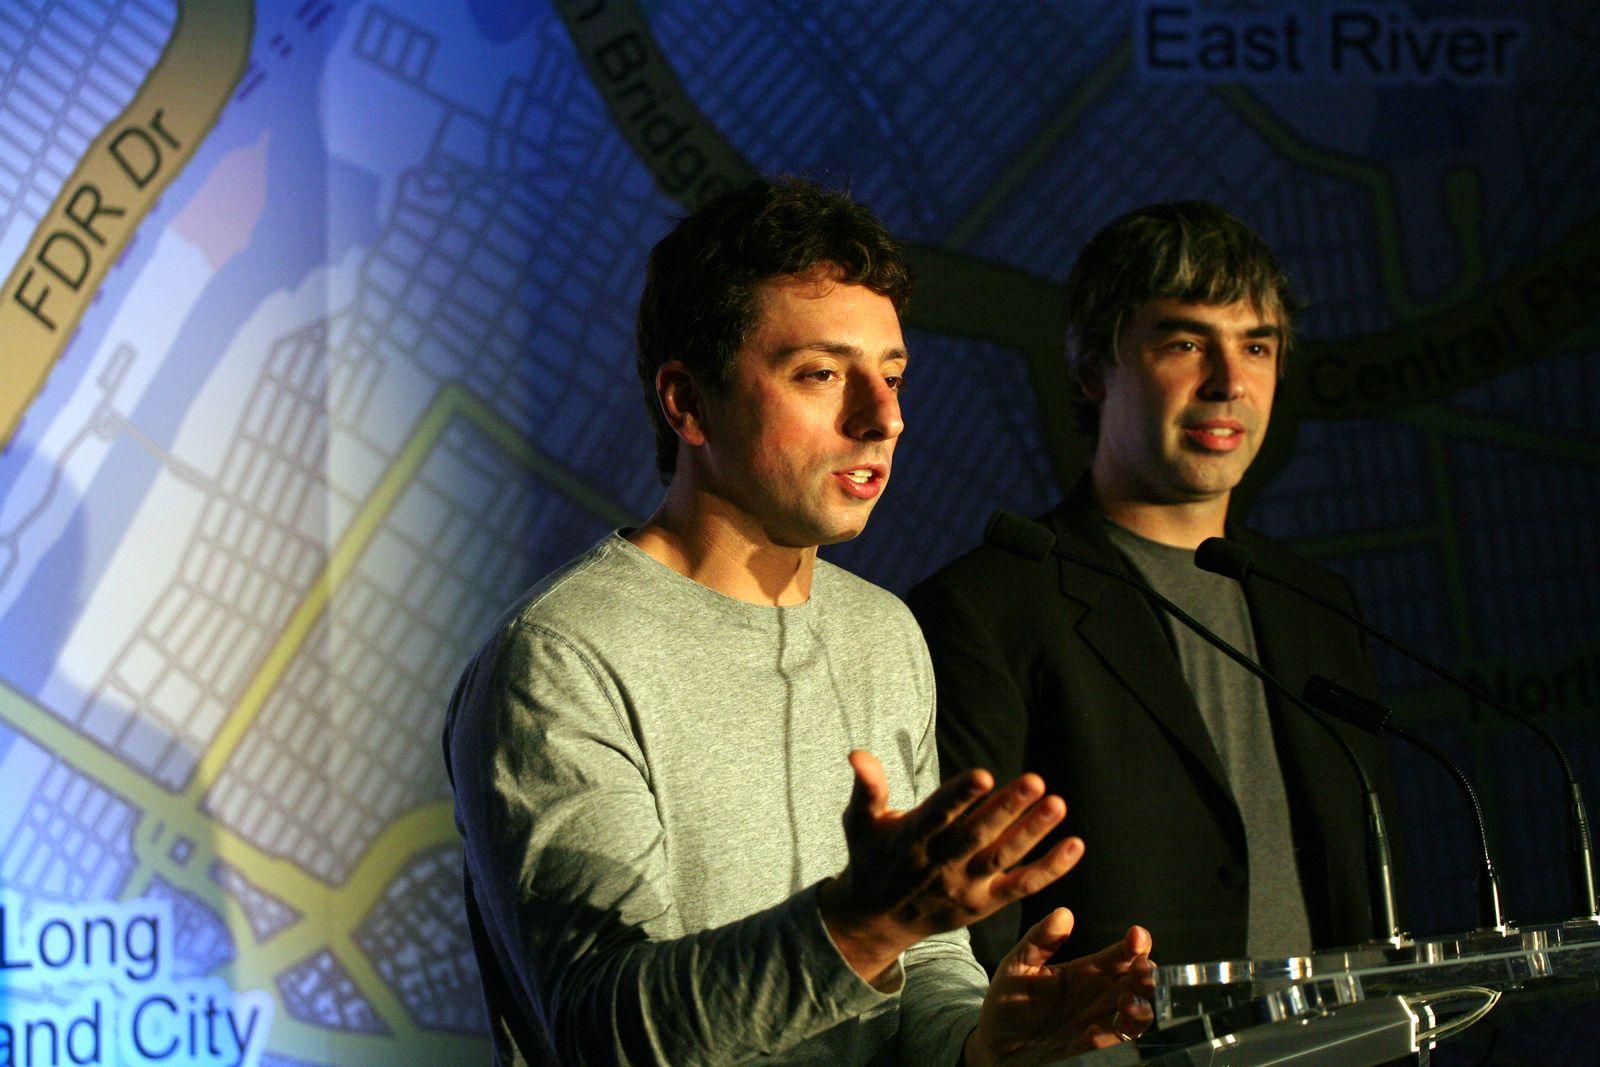 Larry Page / Sergey Brin